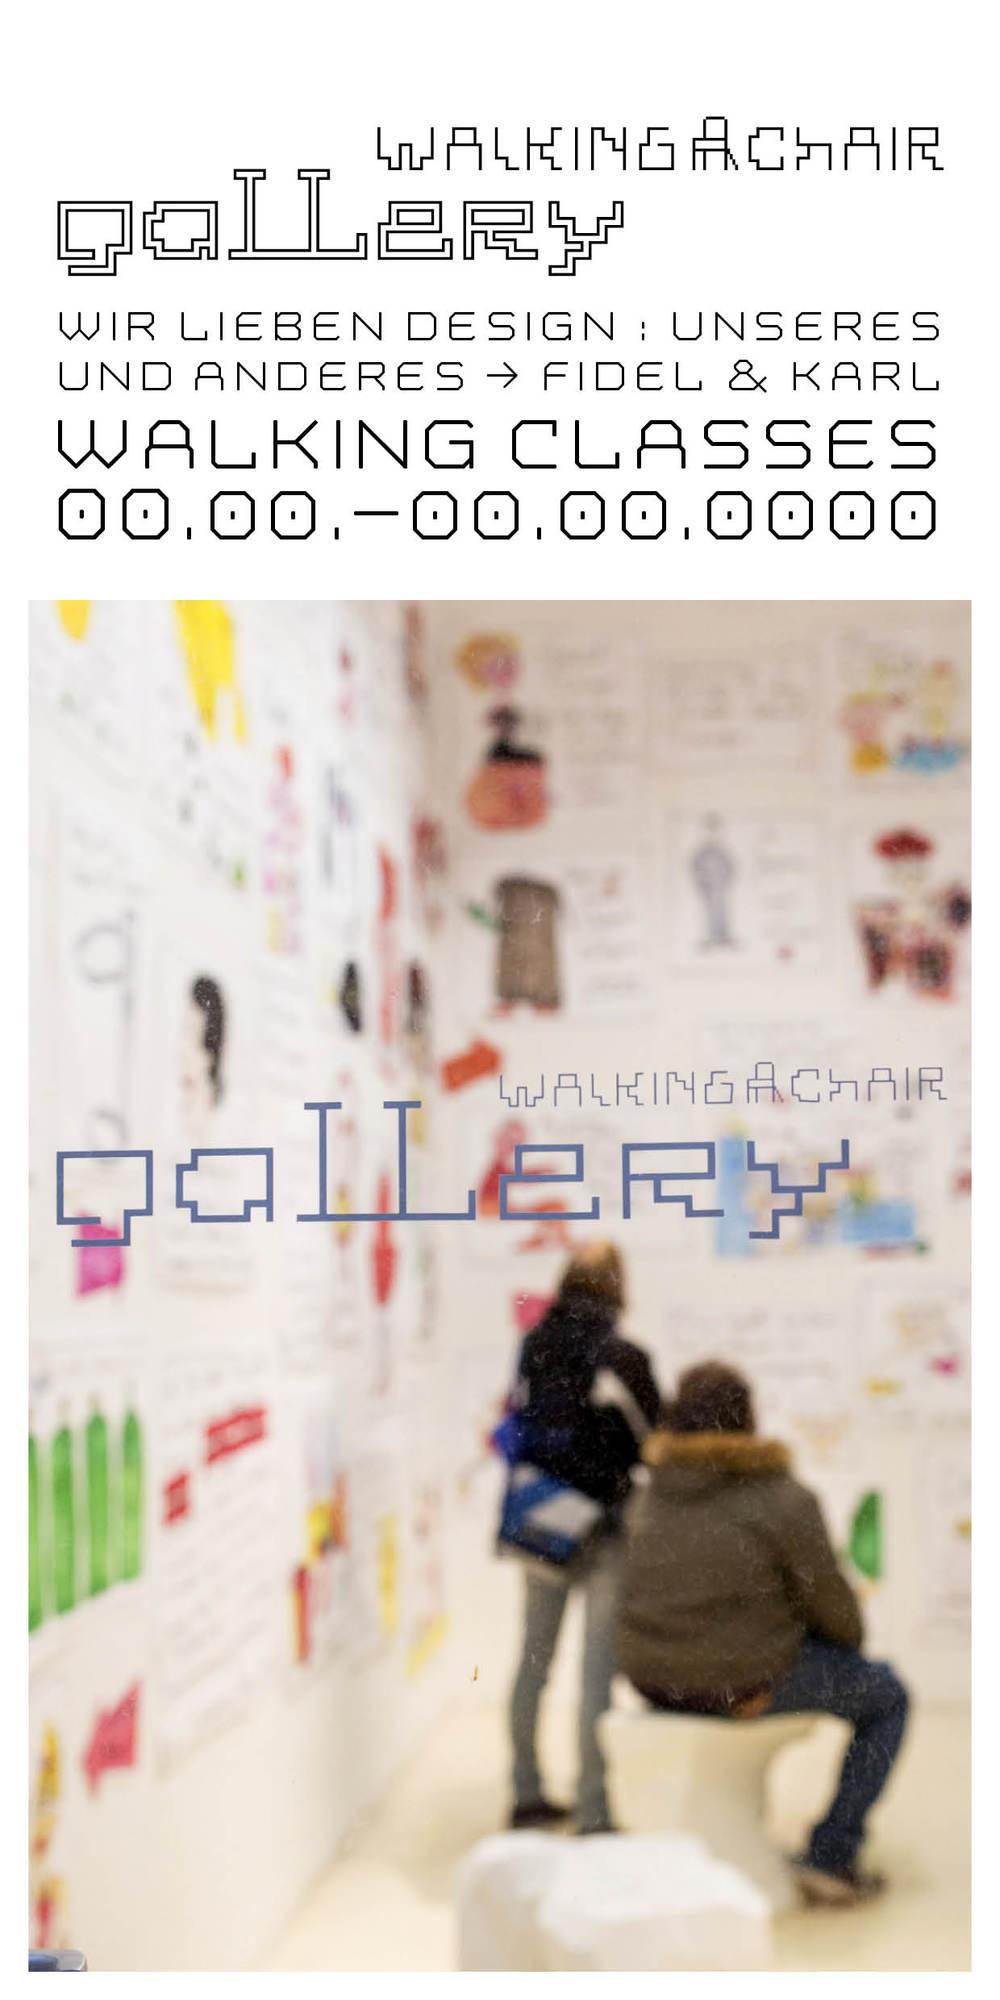 wc_gallery_emtpy.jpg